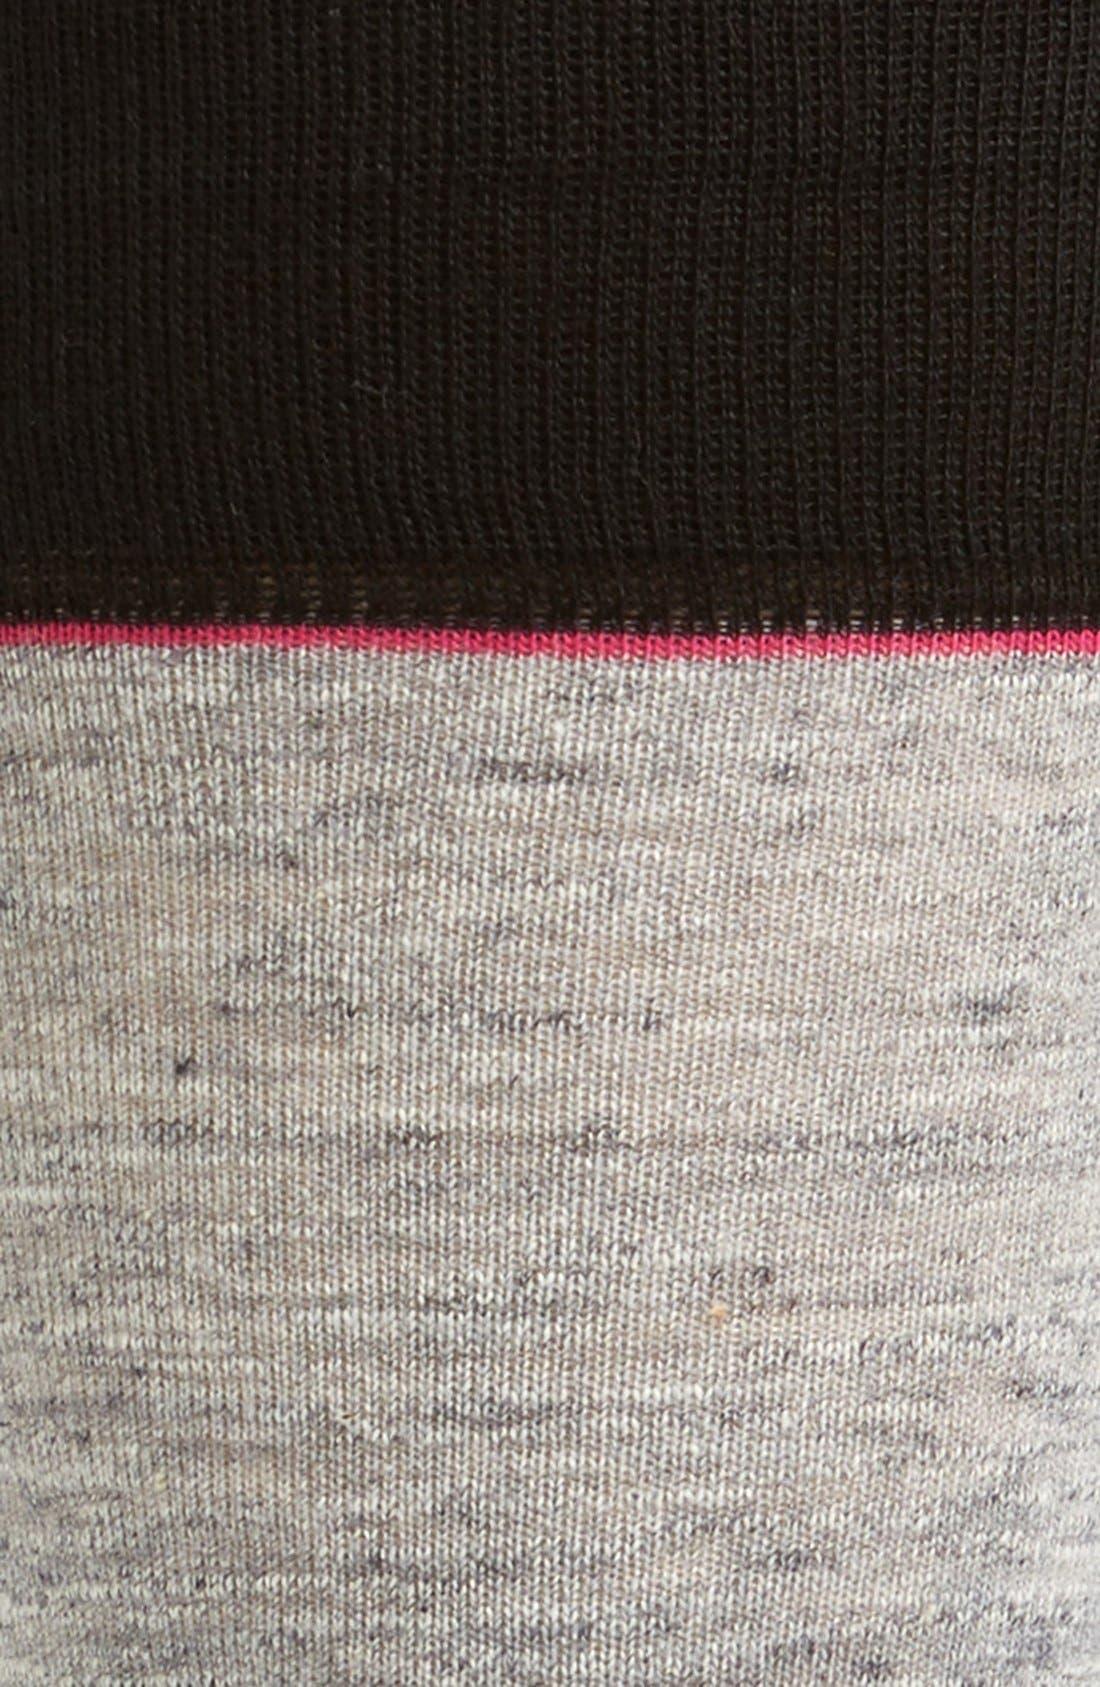 Alternate Image 2  - Etiquette Clothiers Slubby Socks